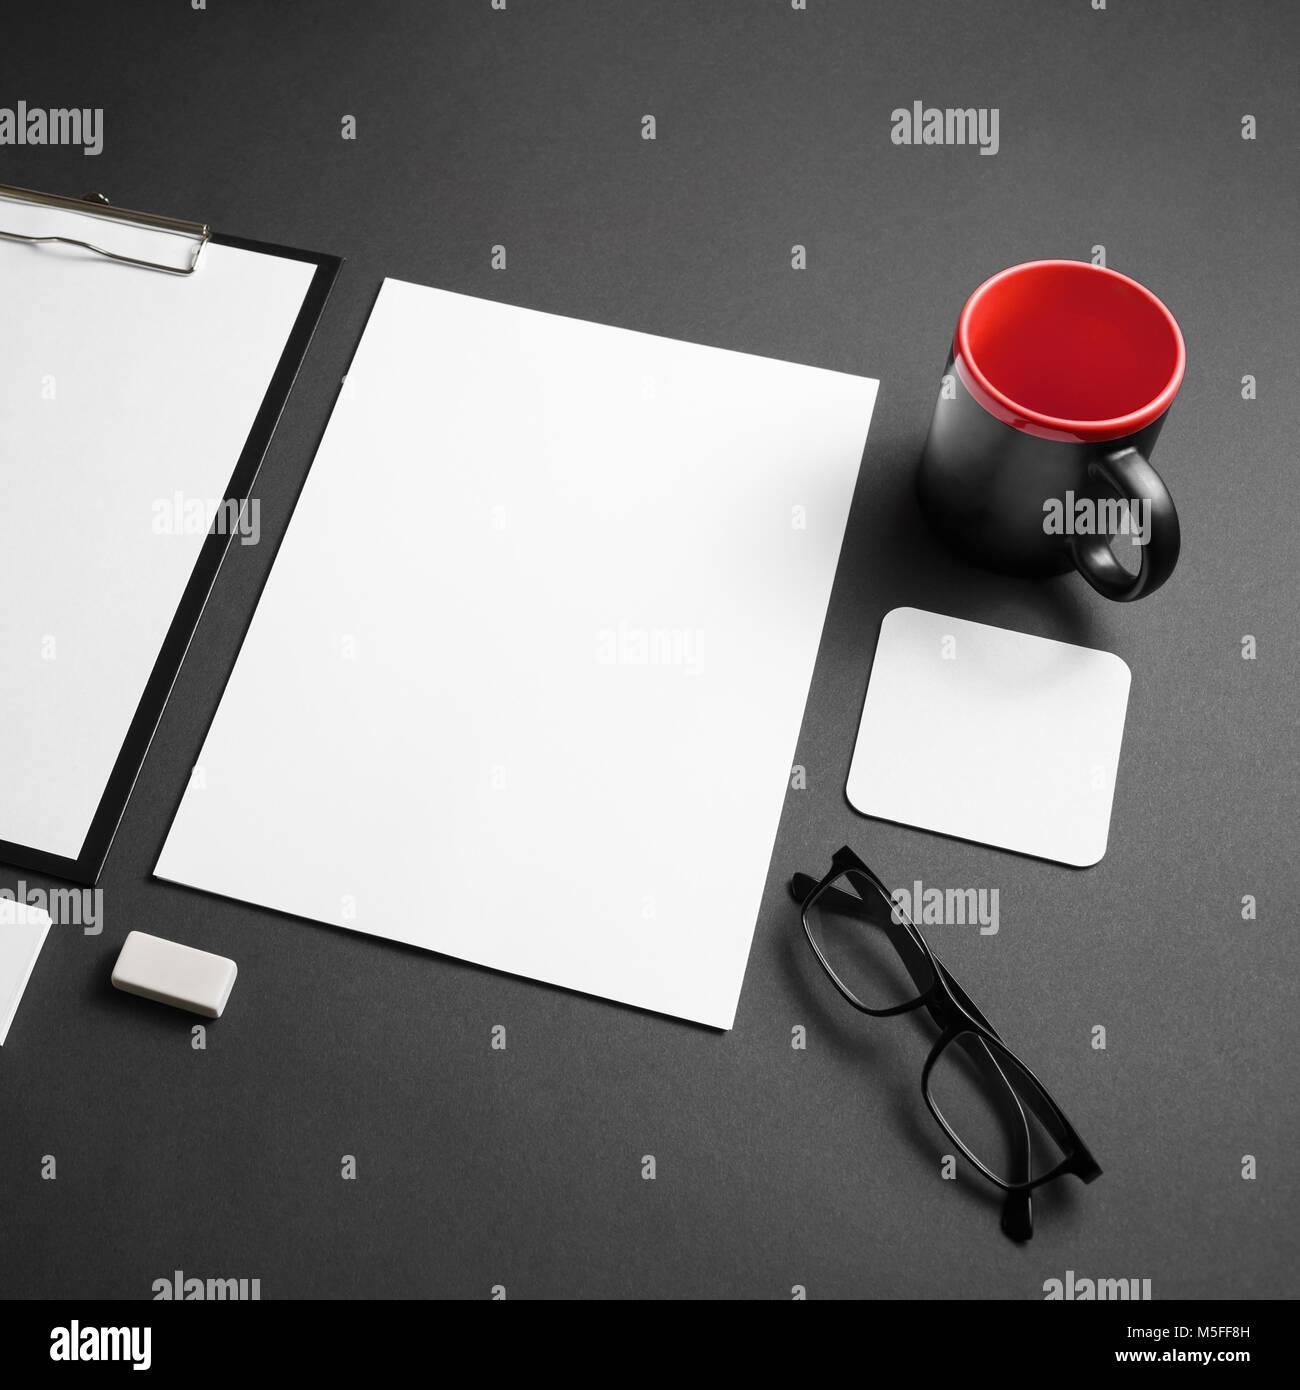 Blank corporate stationery set on black paper background. Branding mock-up. Stock Photo